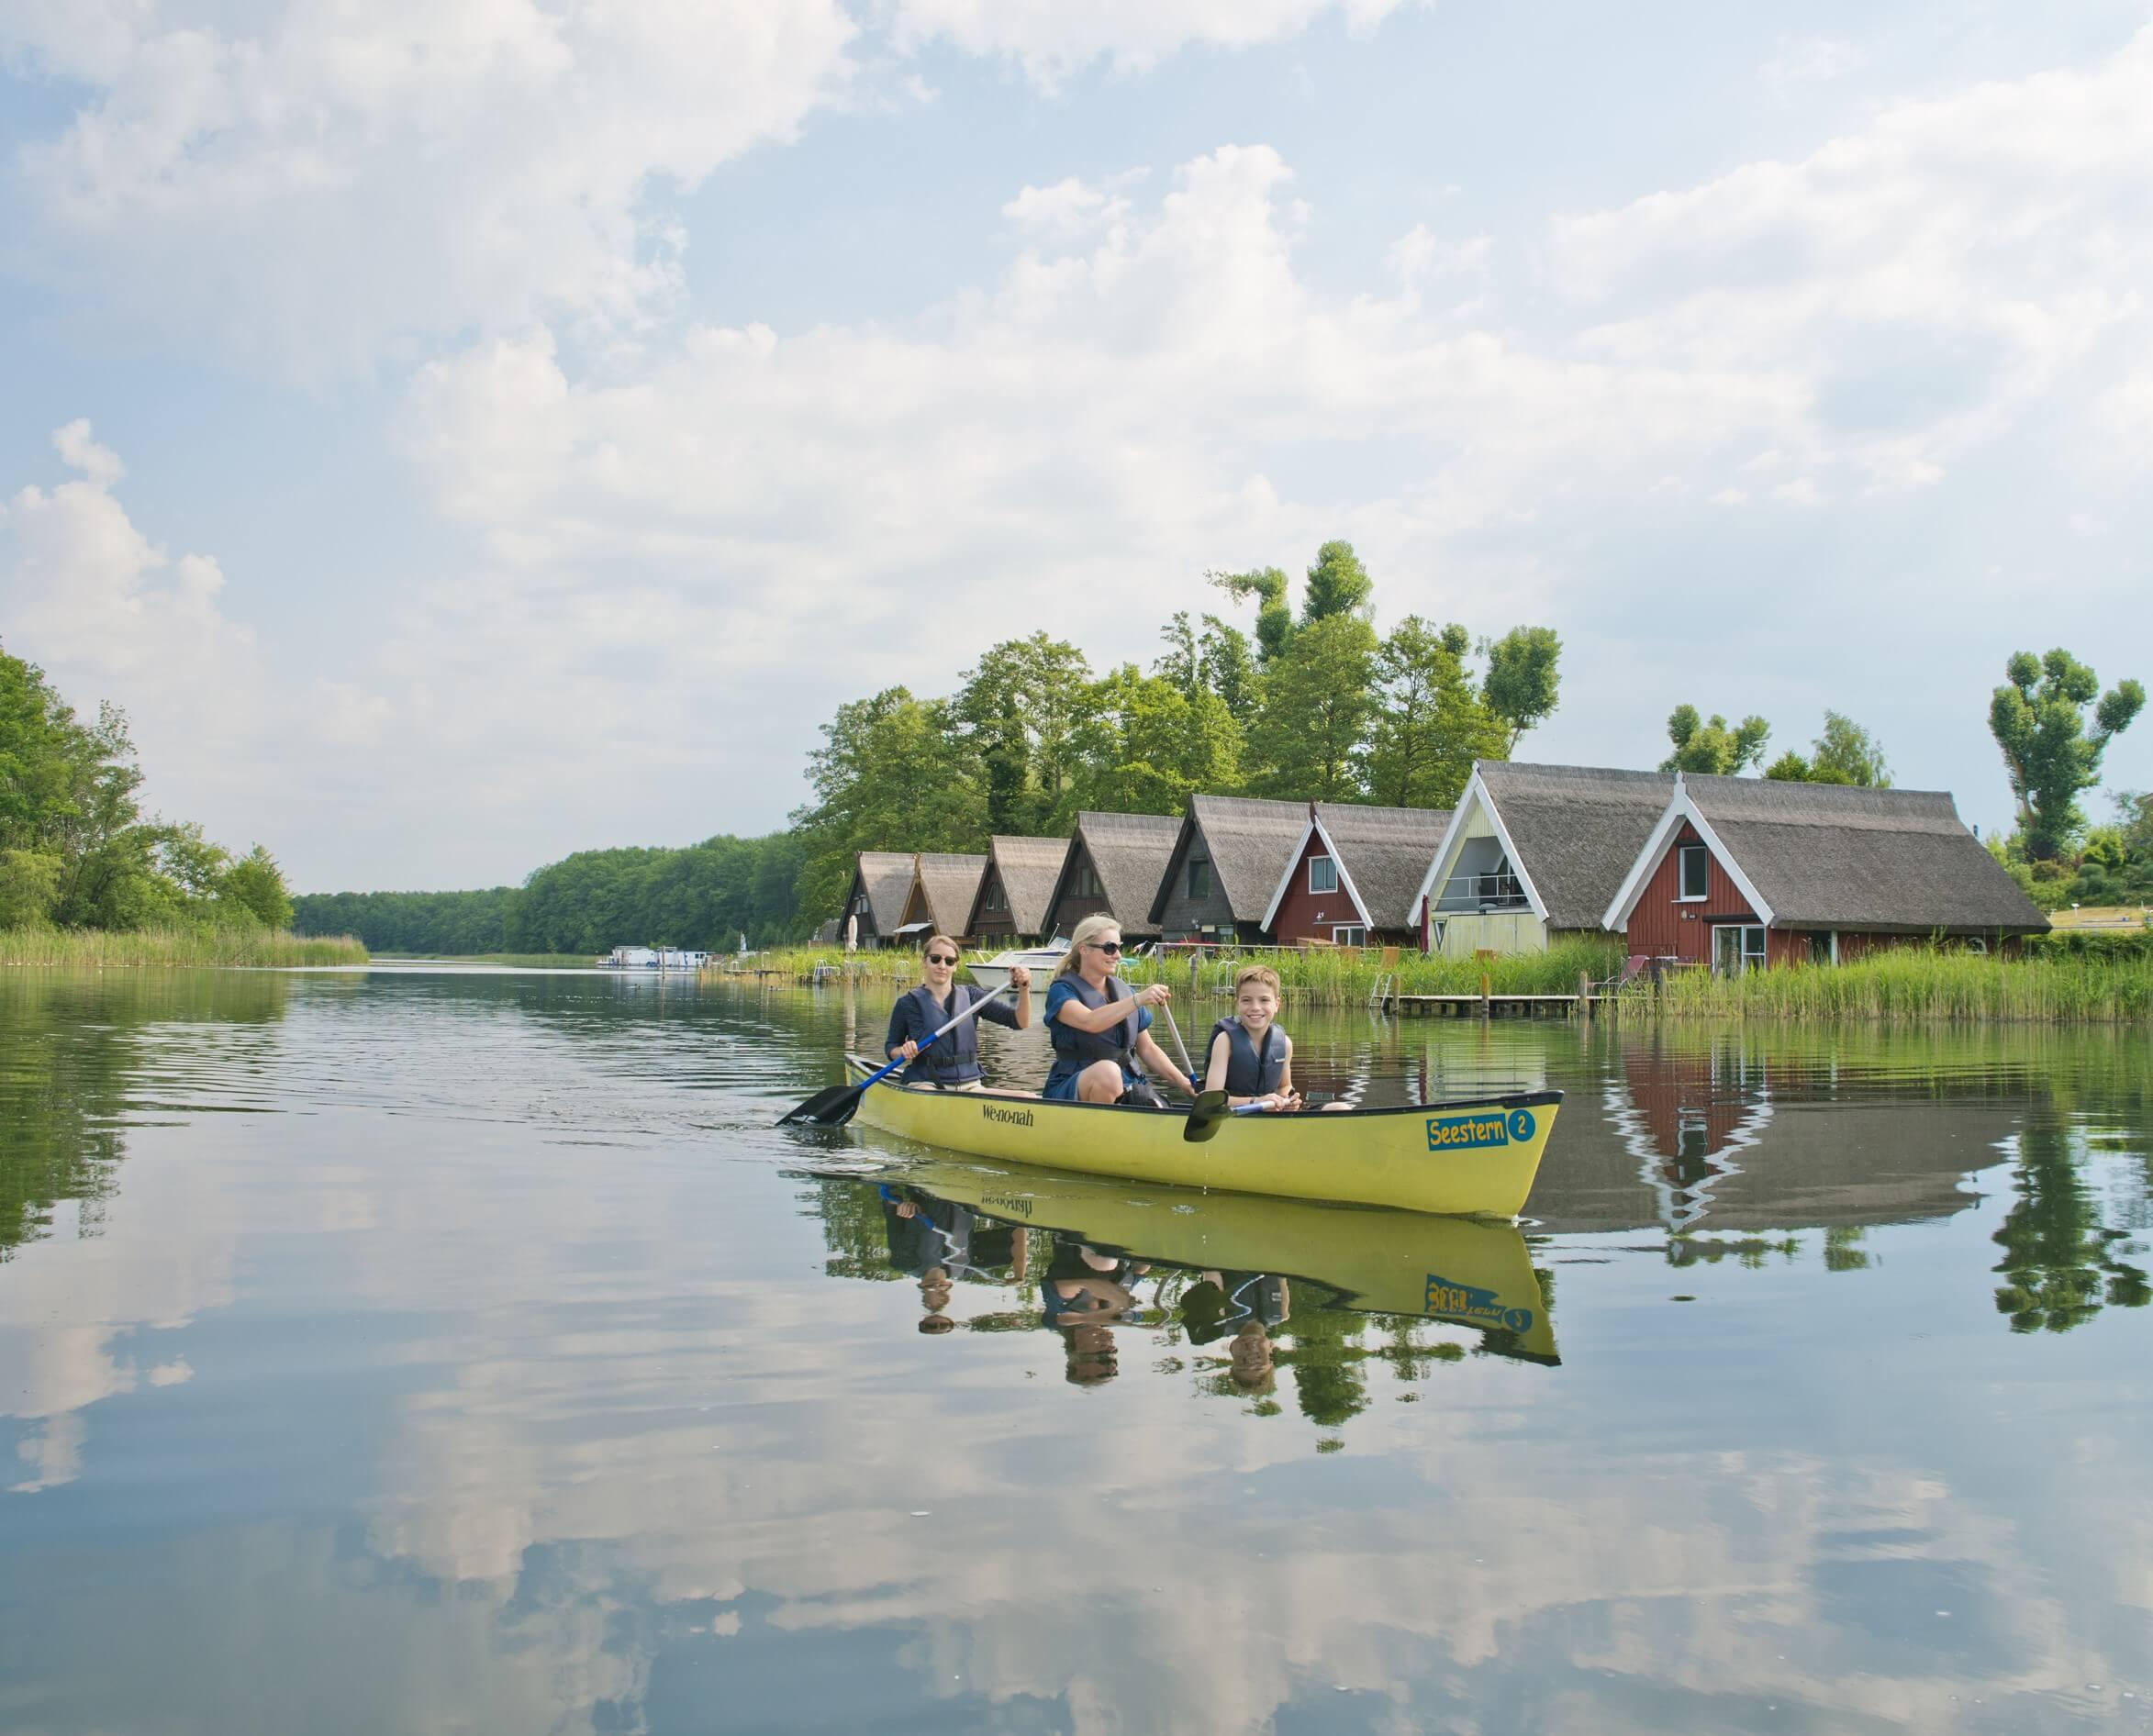 Kajaktour: In der Mecklenburgischen Seenplatte